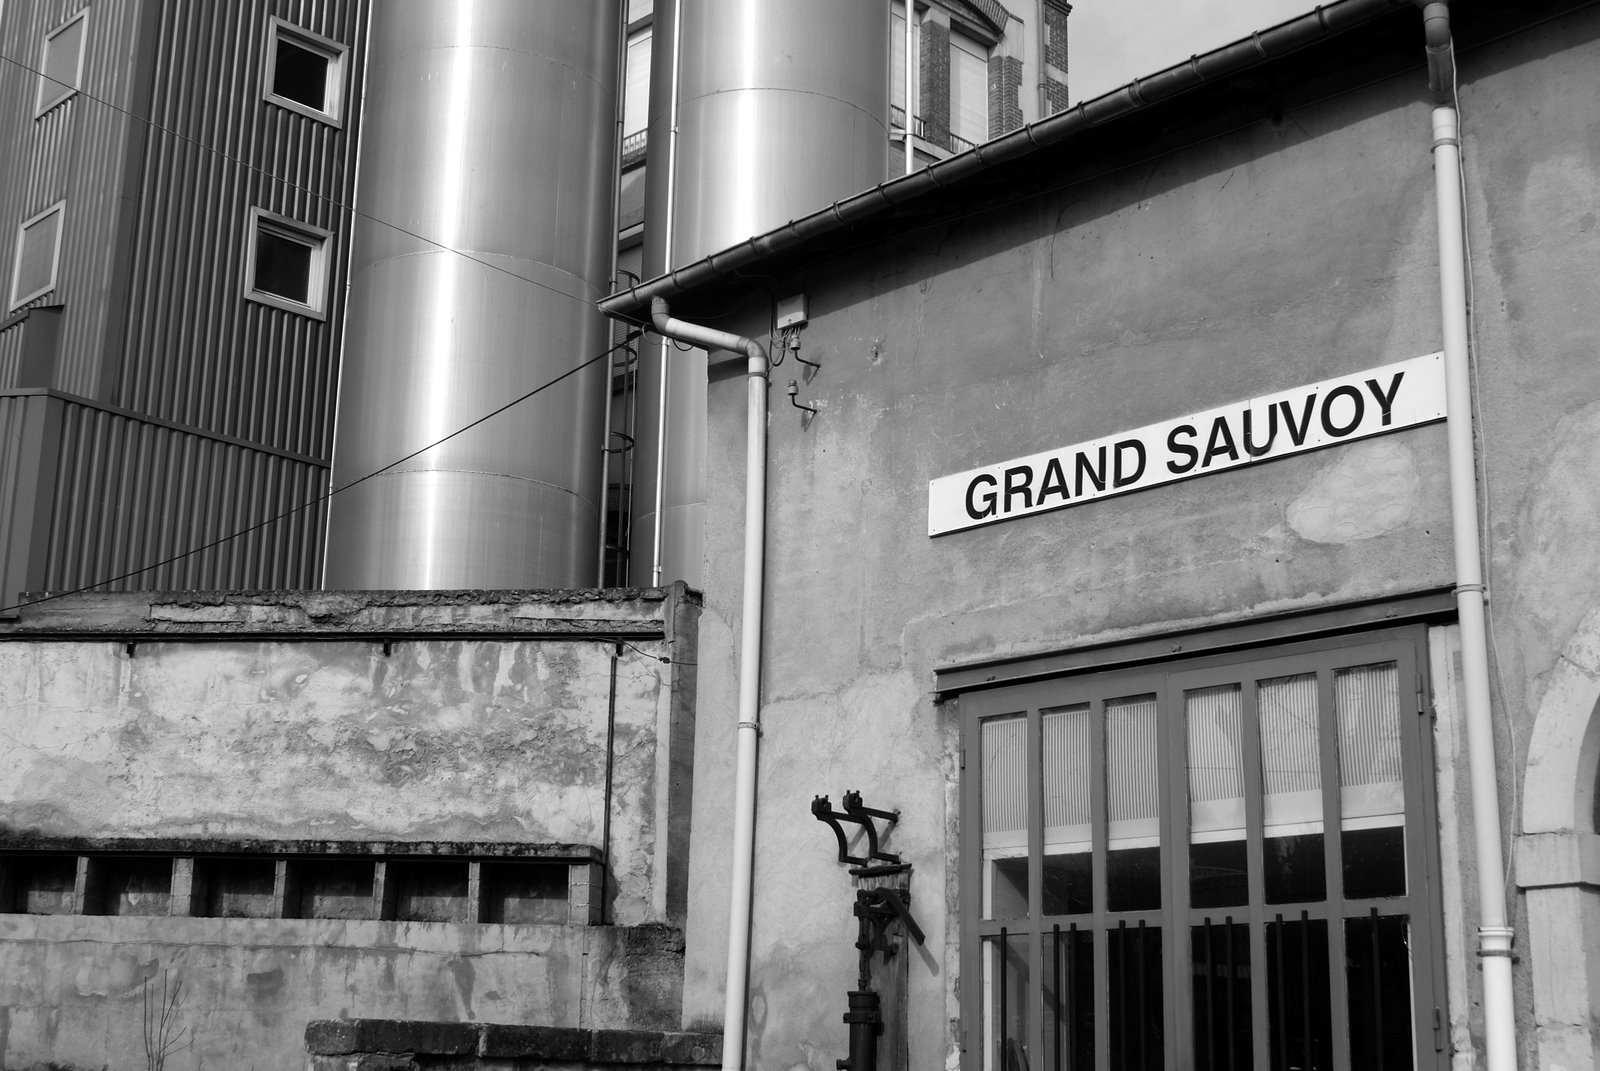 Foyer Grand Sauvoy Nancy : Le grand sauvoy pres de nancy a maxéville …le foyer du